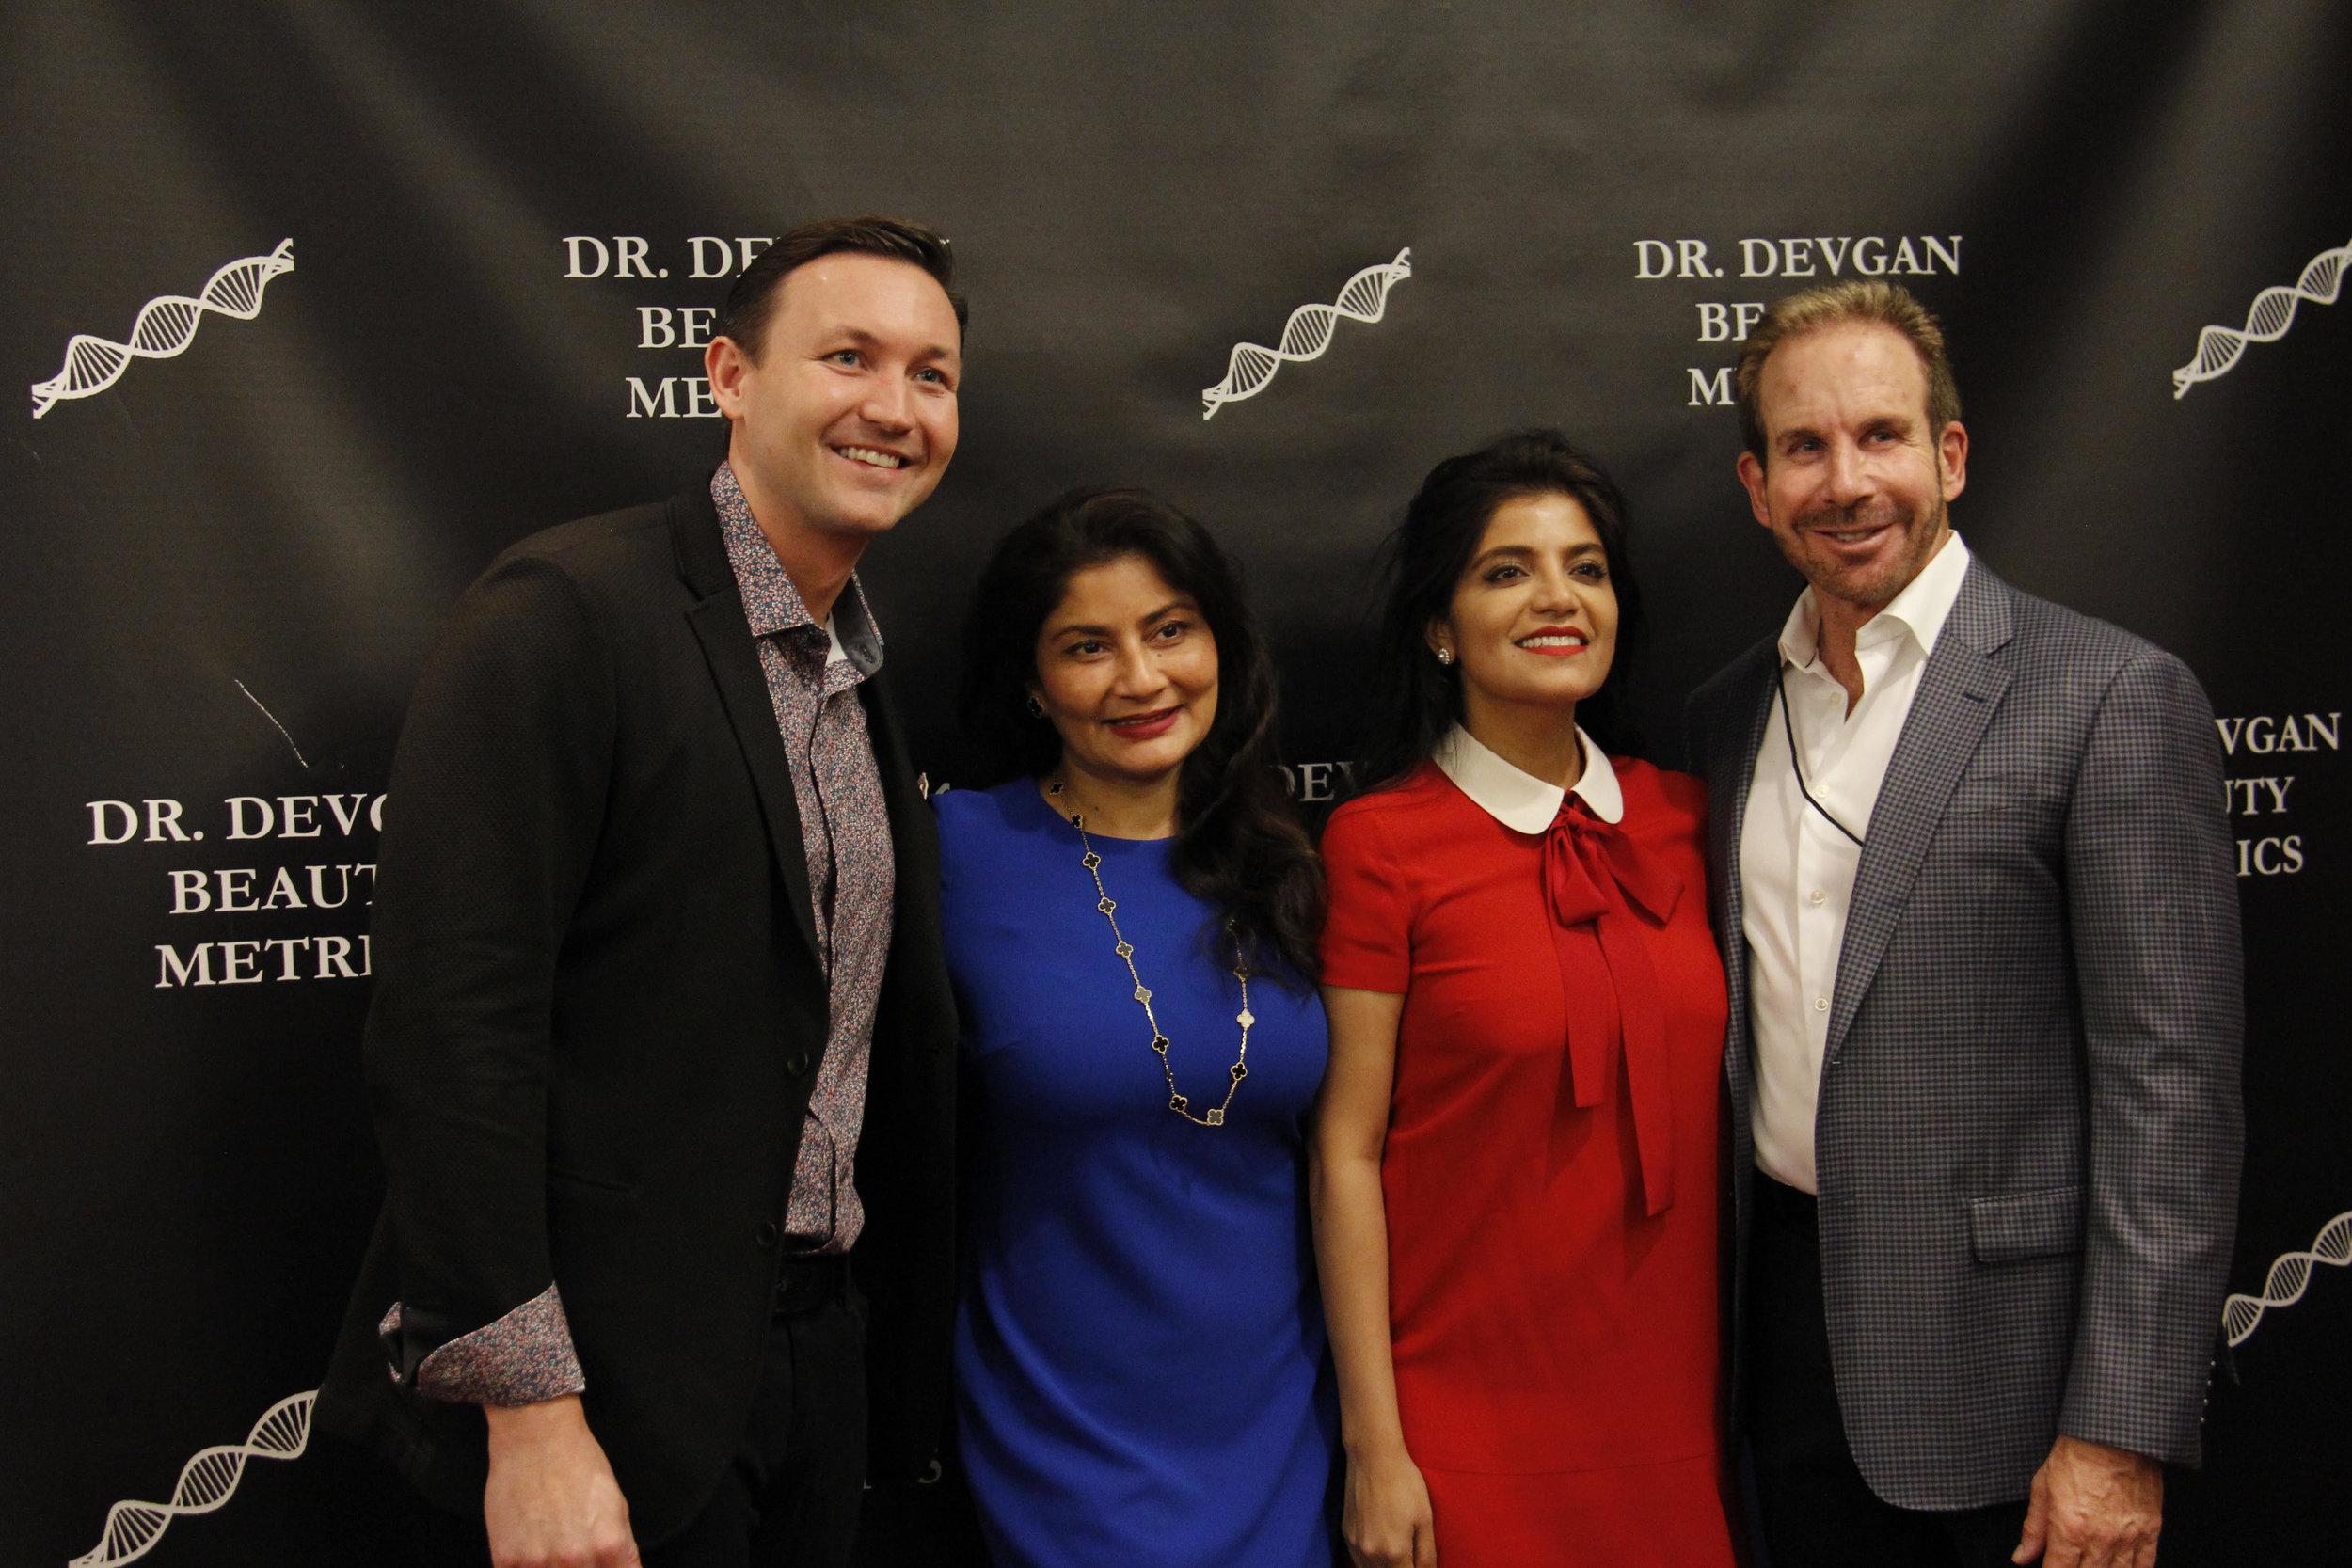 Pictured from left to right: Dr. Christopher Surek, Dr. Kay Durairaj, Dr. Lara Devgan, and Dr. David Funt